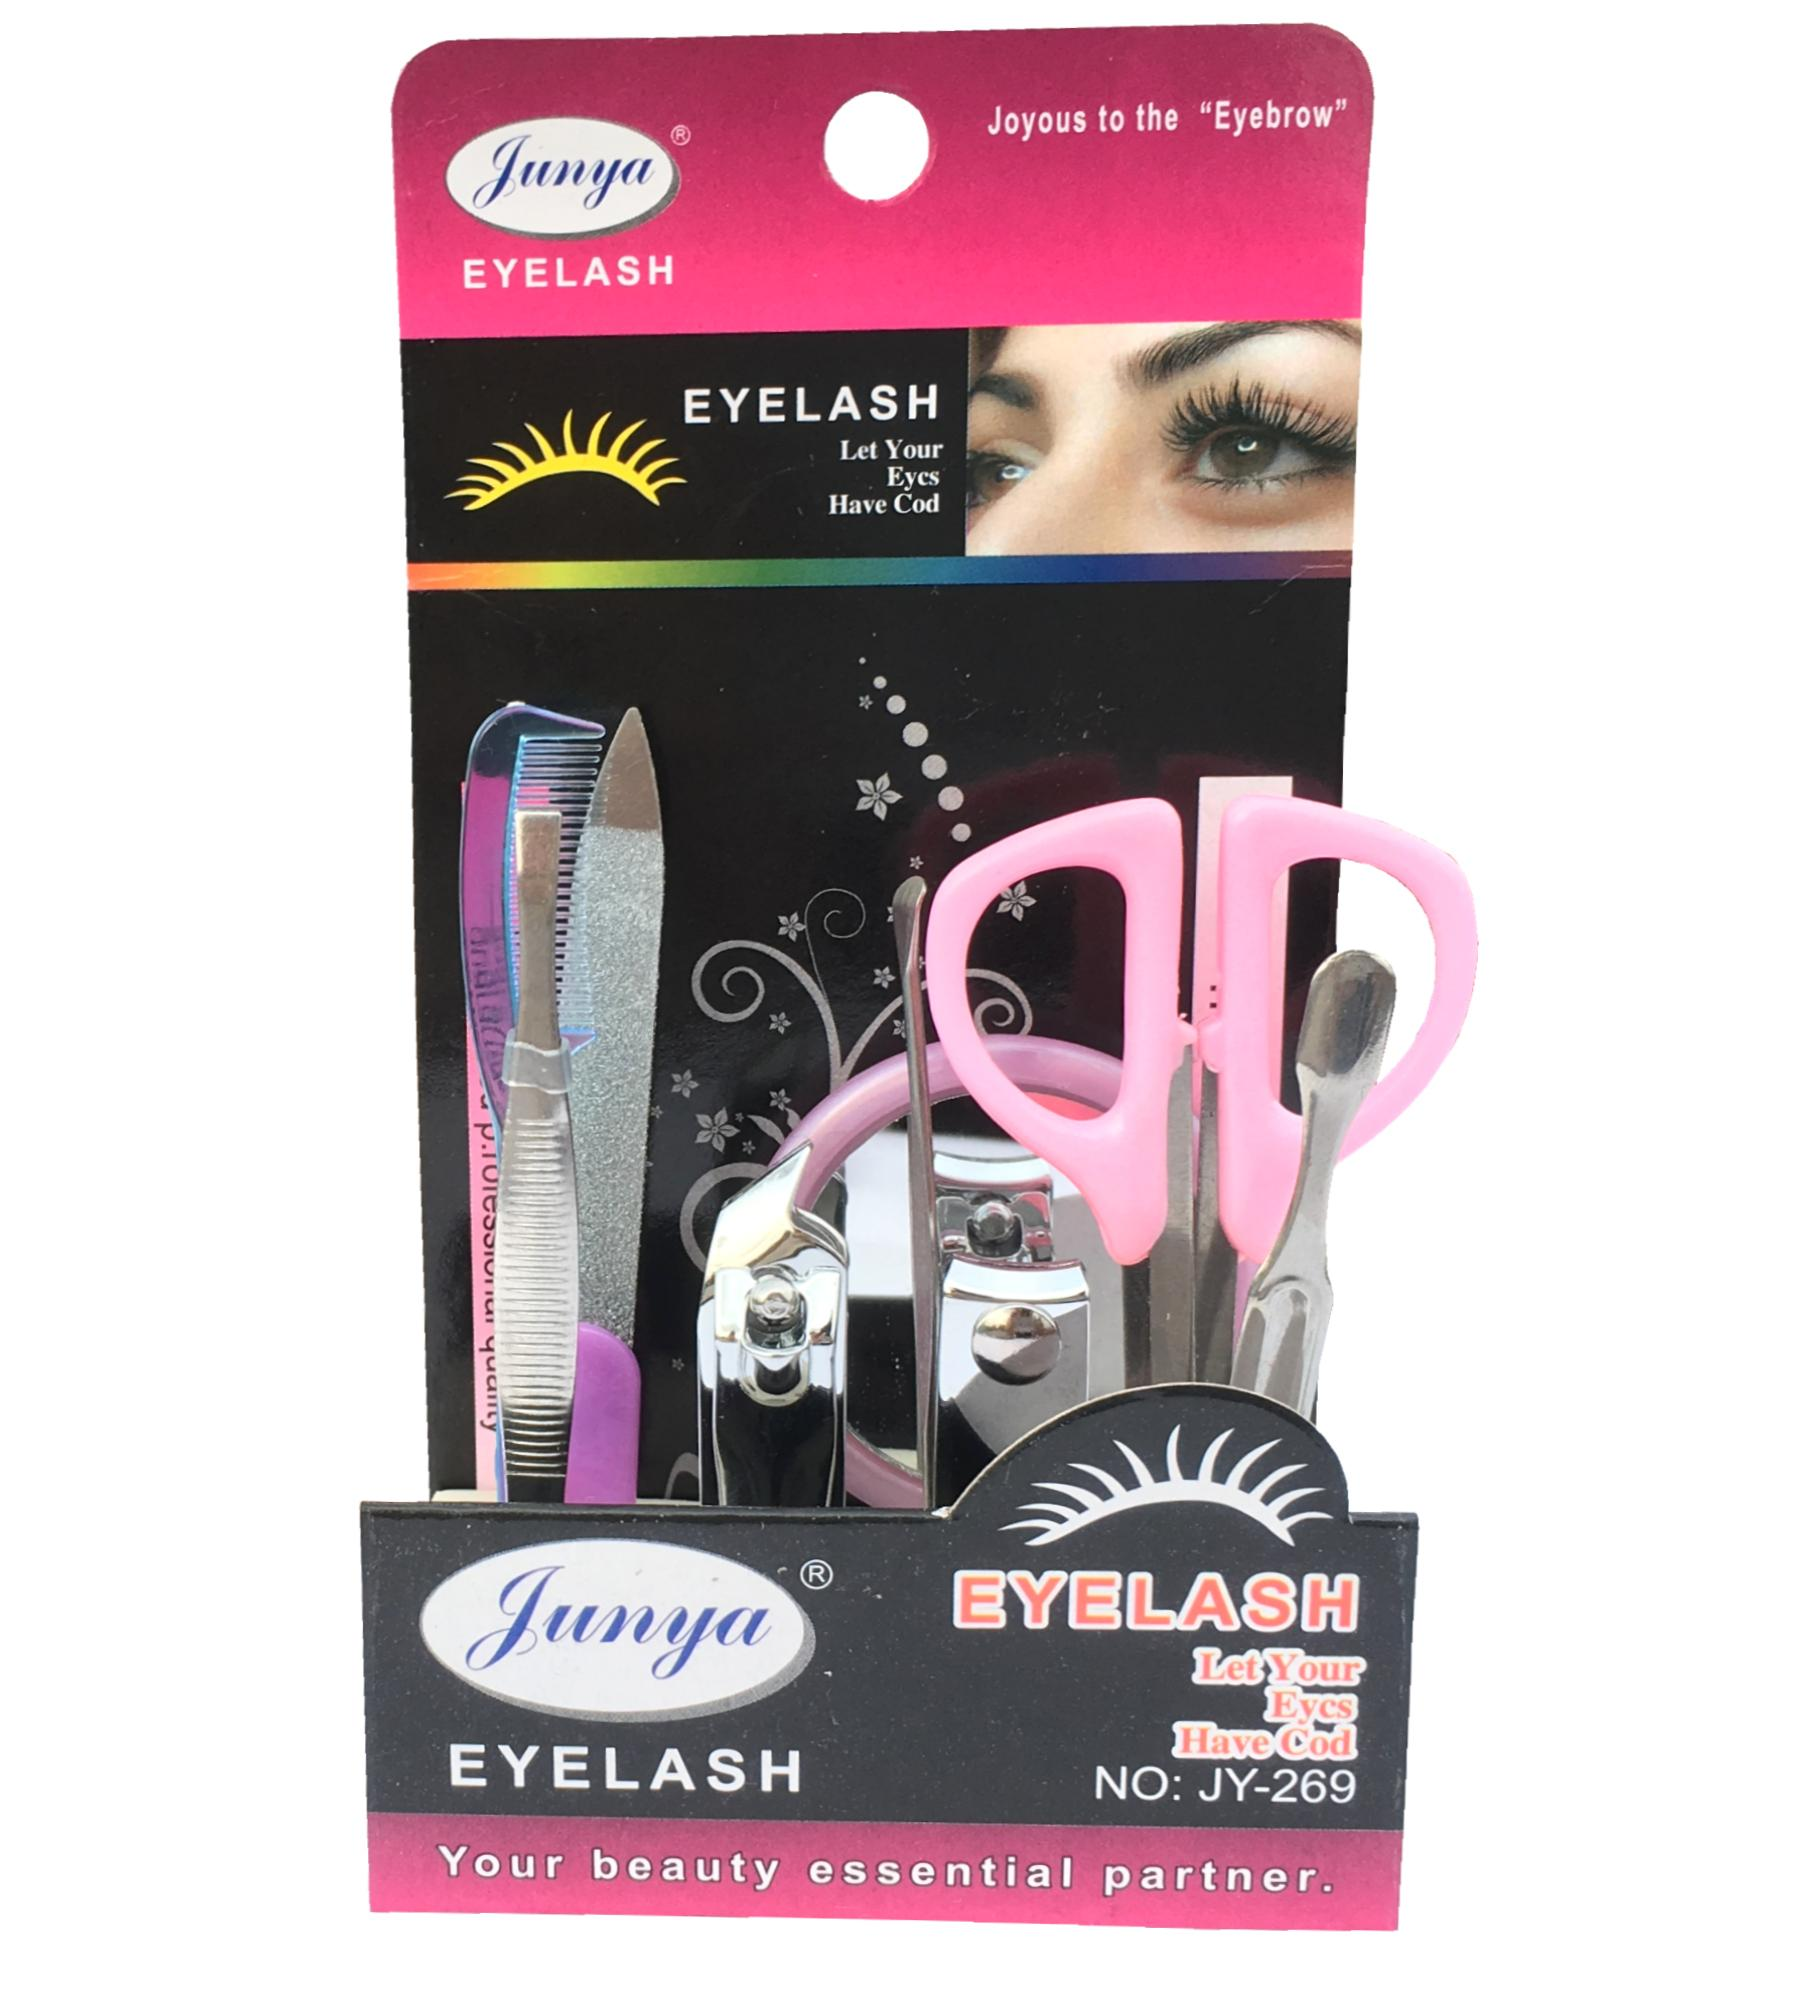 Eyelash Your Beauty Essential Partner Box